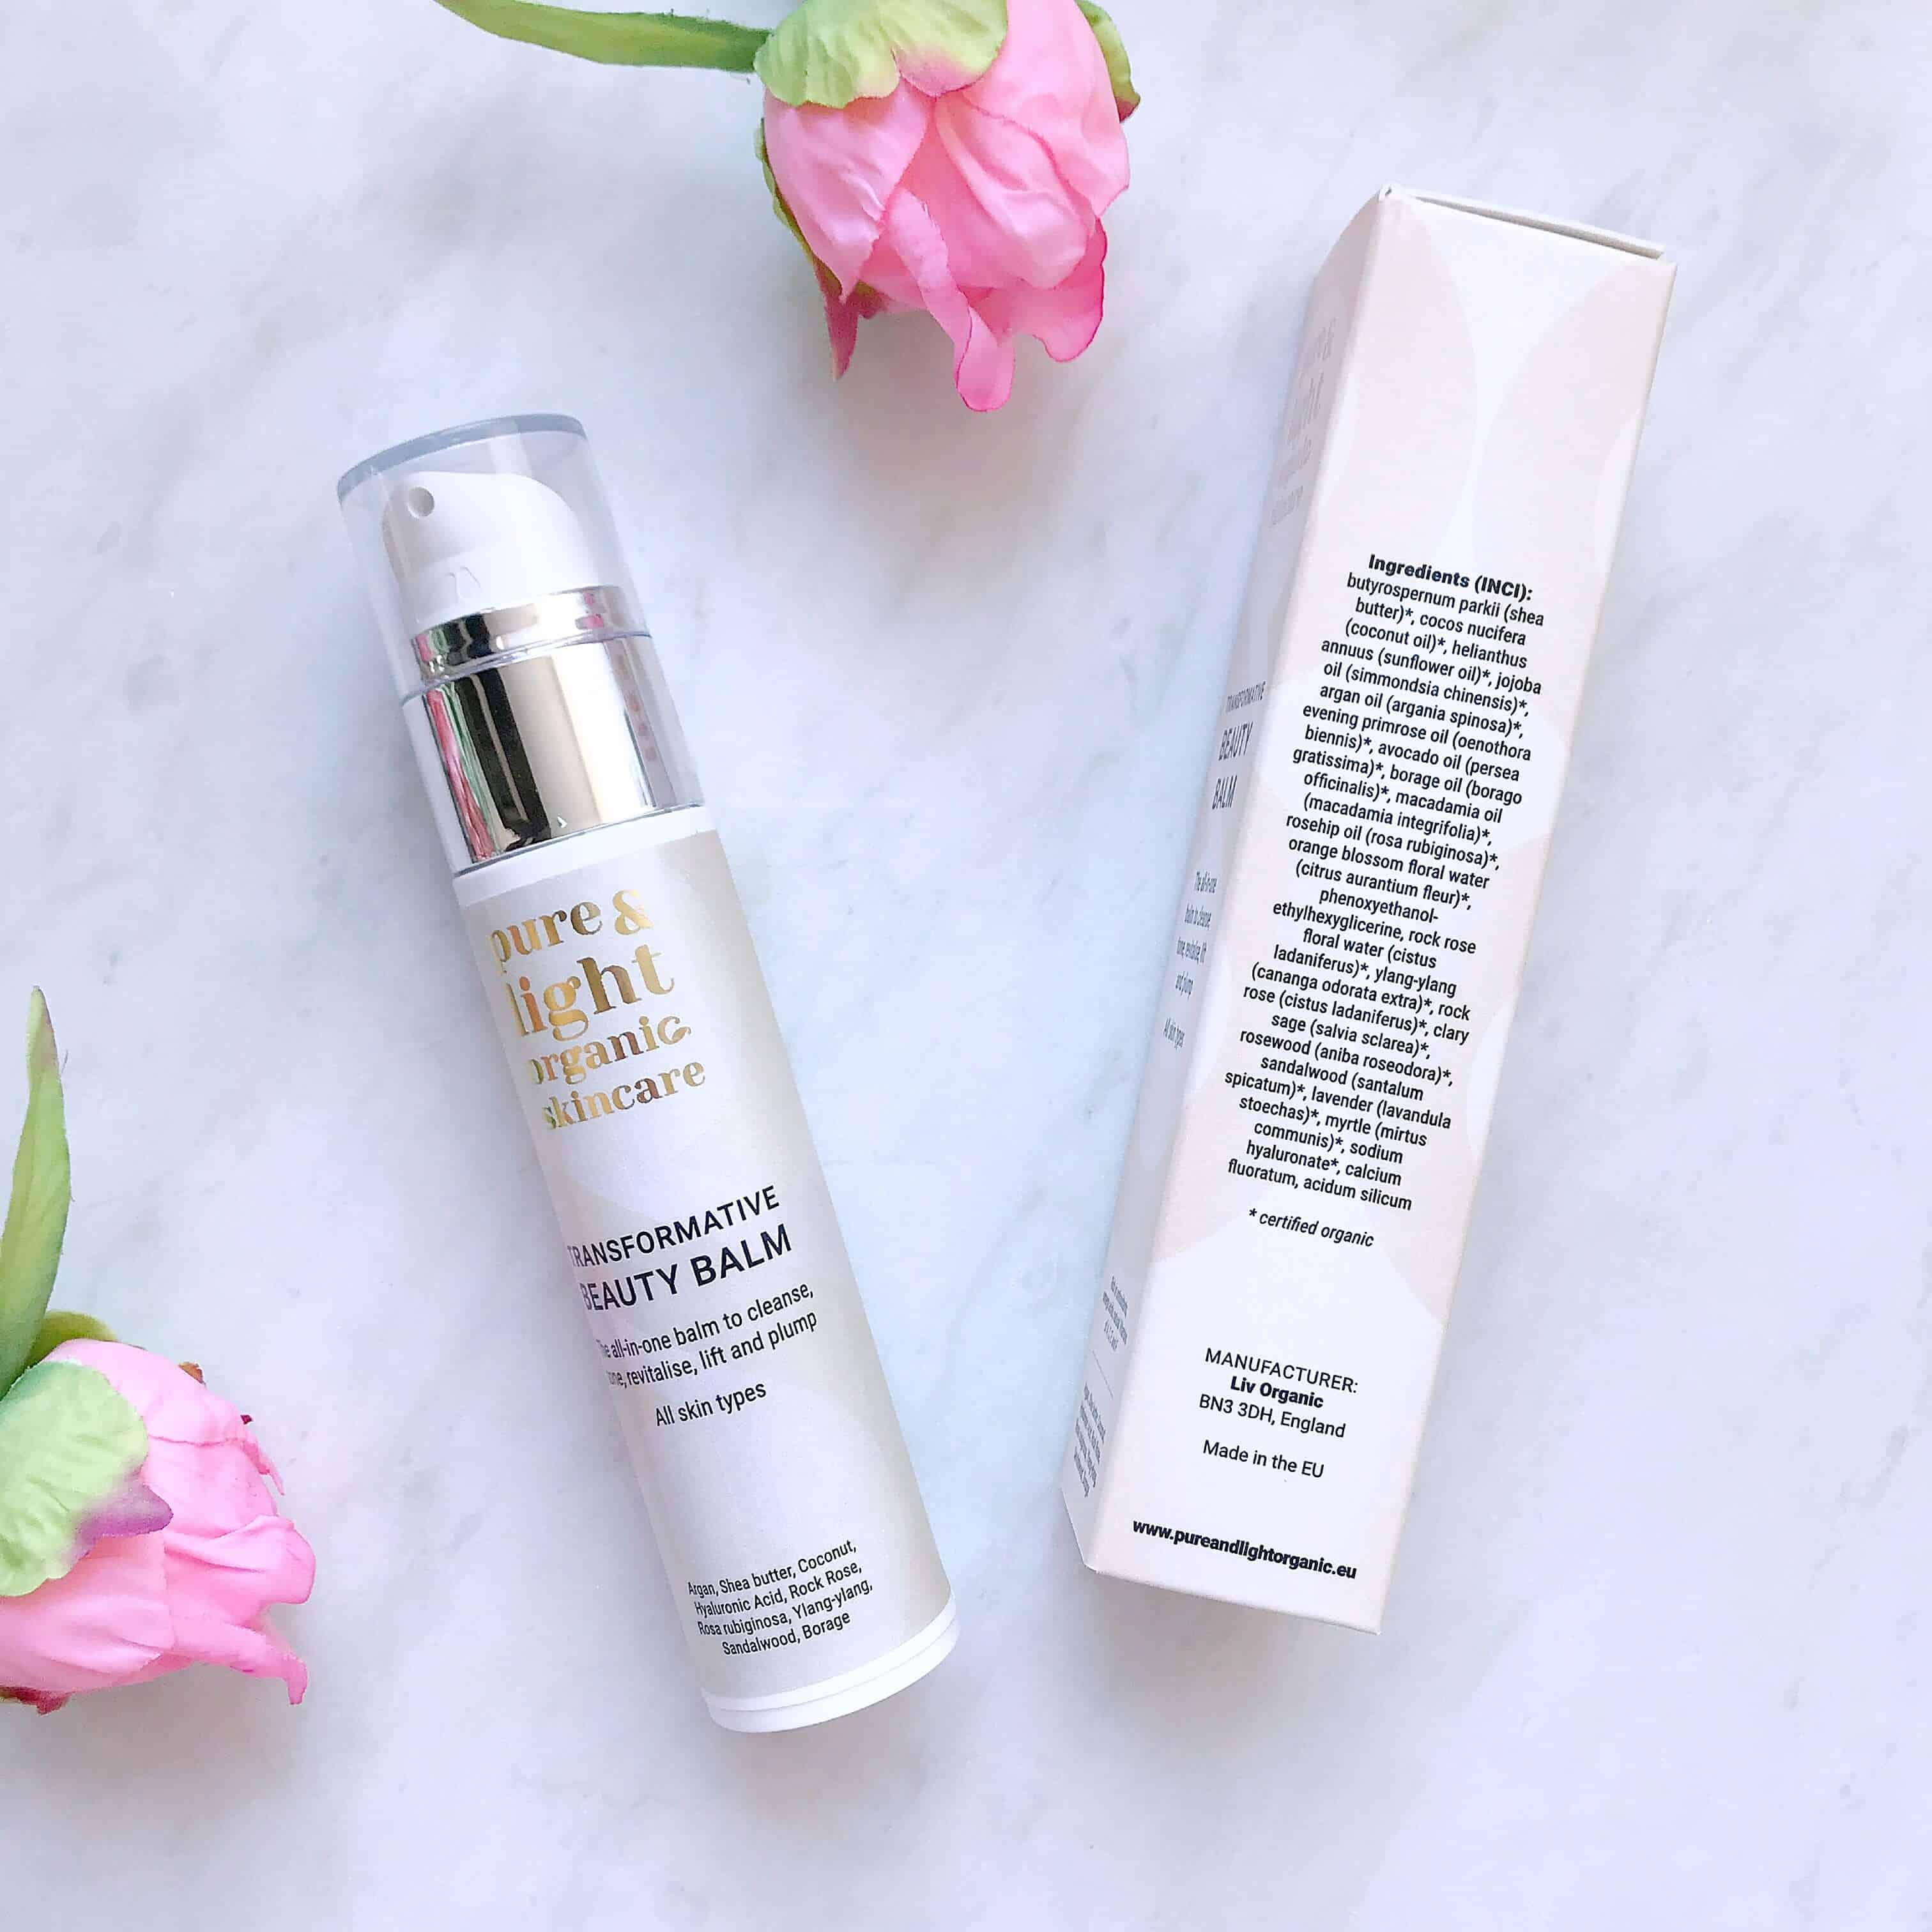 Pure & Light Organic Skincare Transformative Beauty Balm ingredients